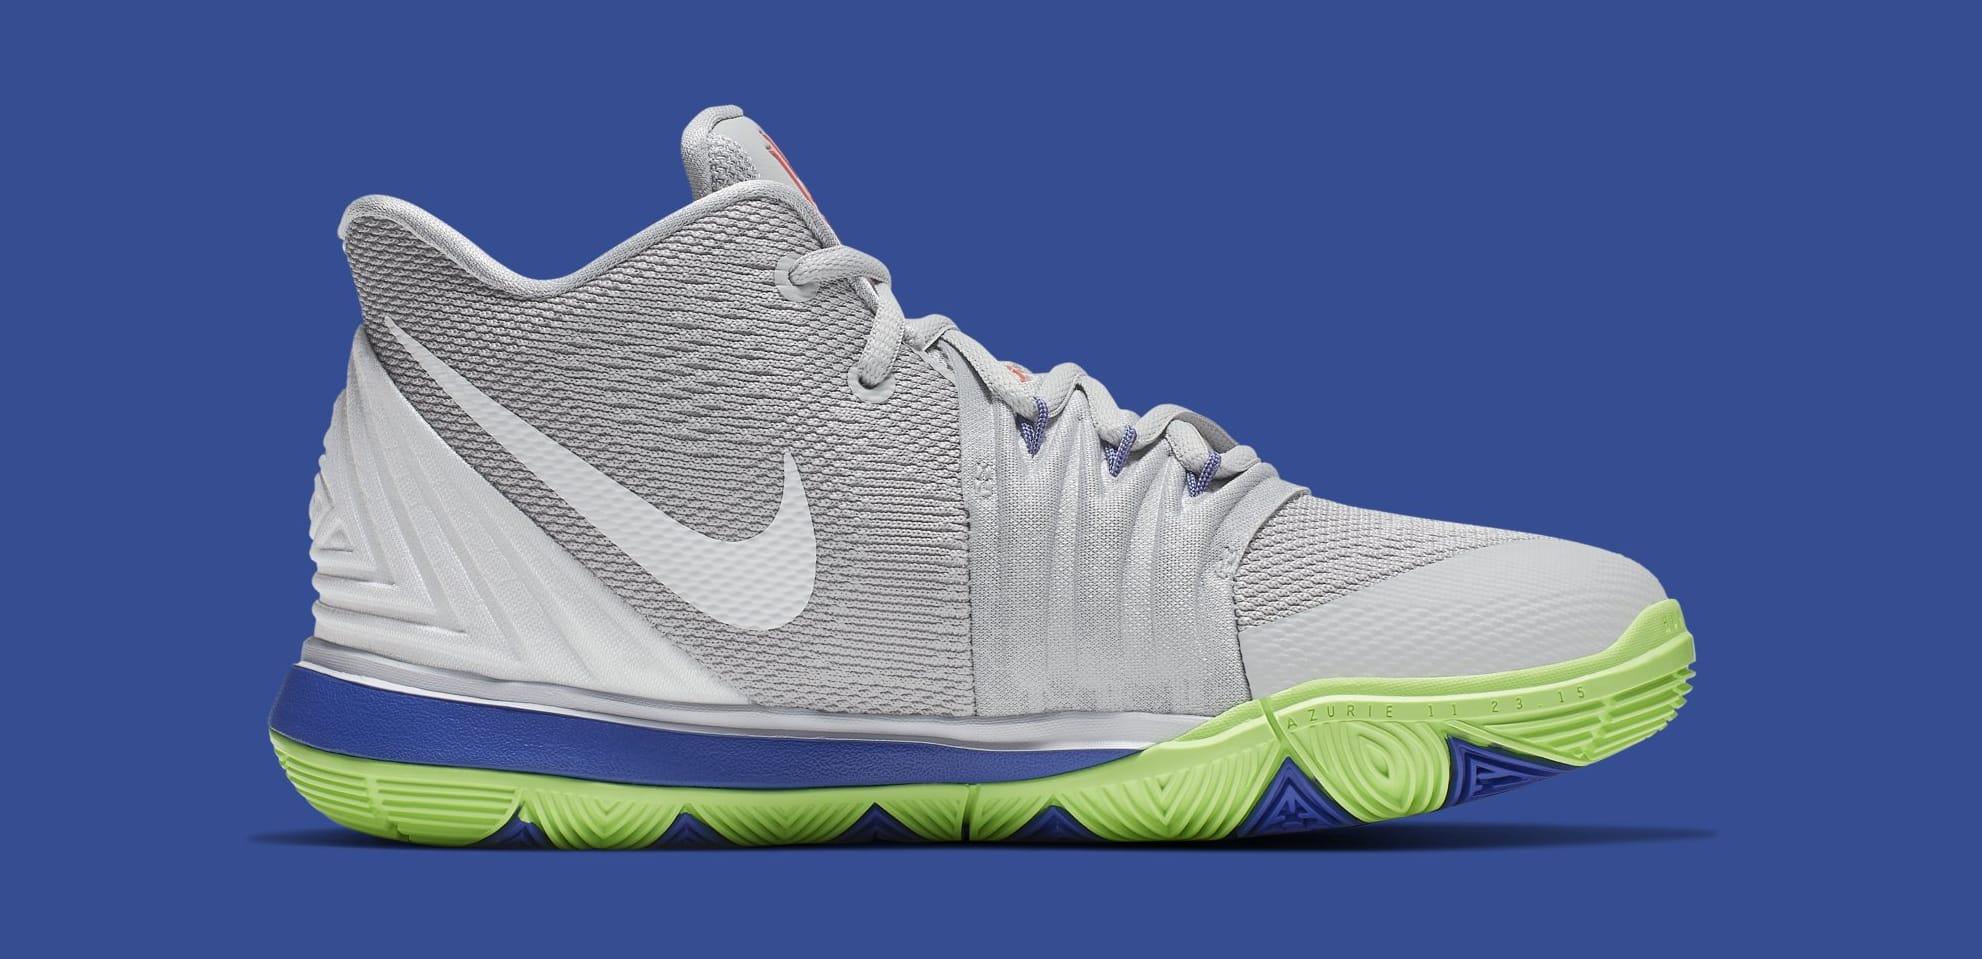 Nike Kyrie 5 AQ2456-099 (Medial)